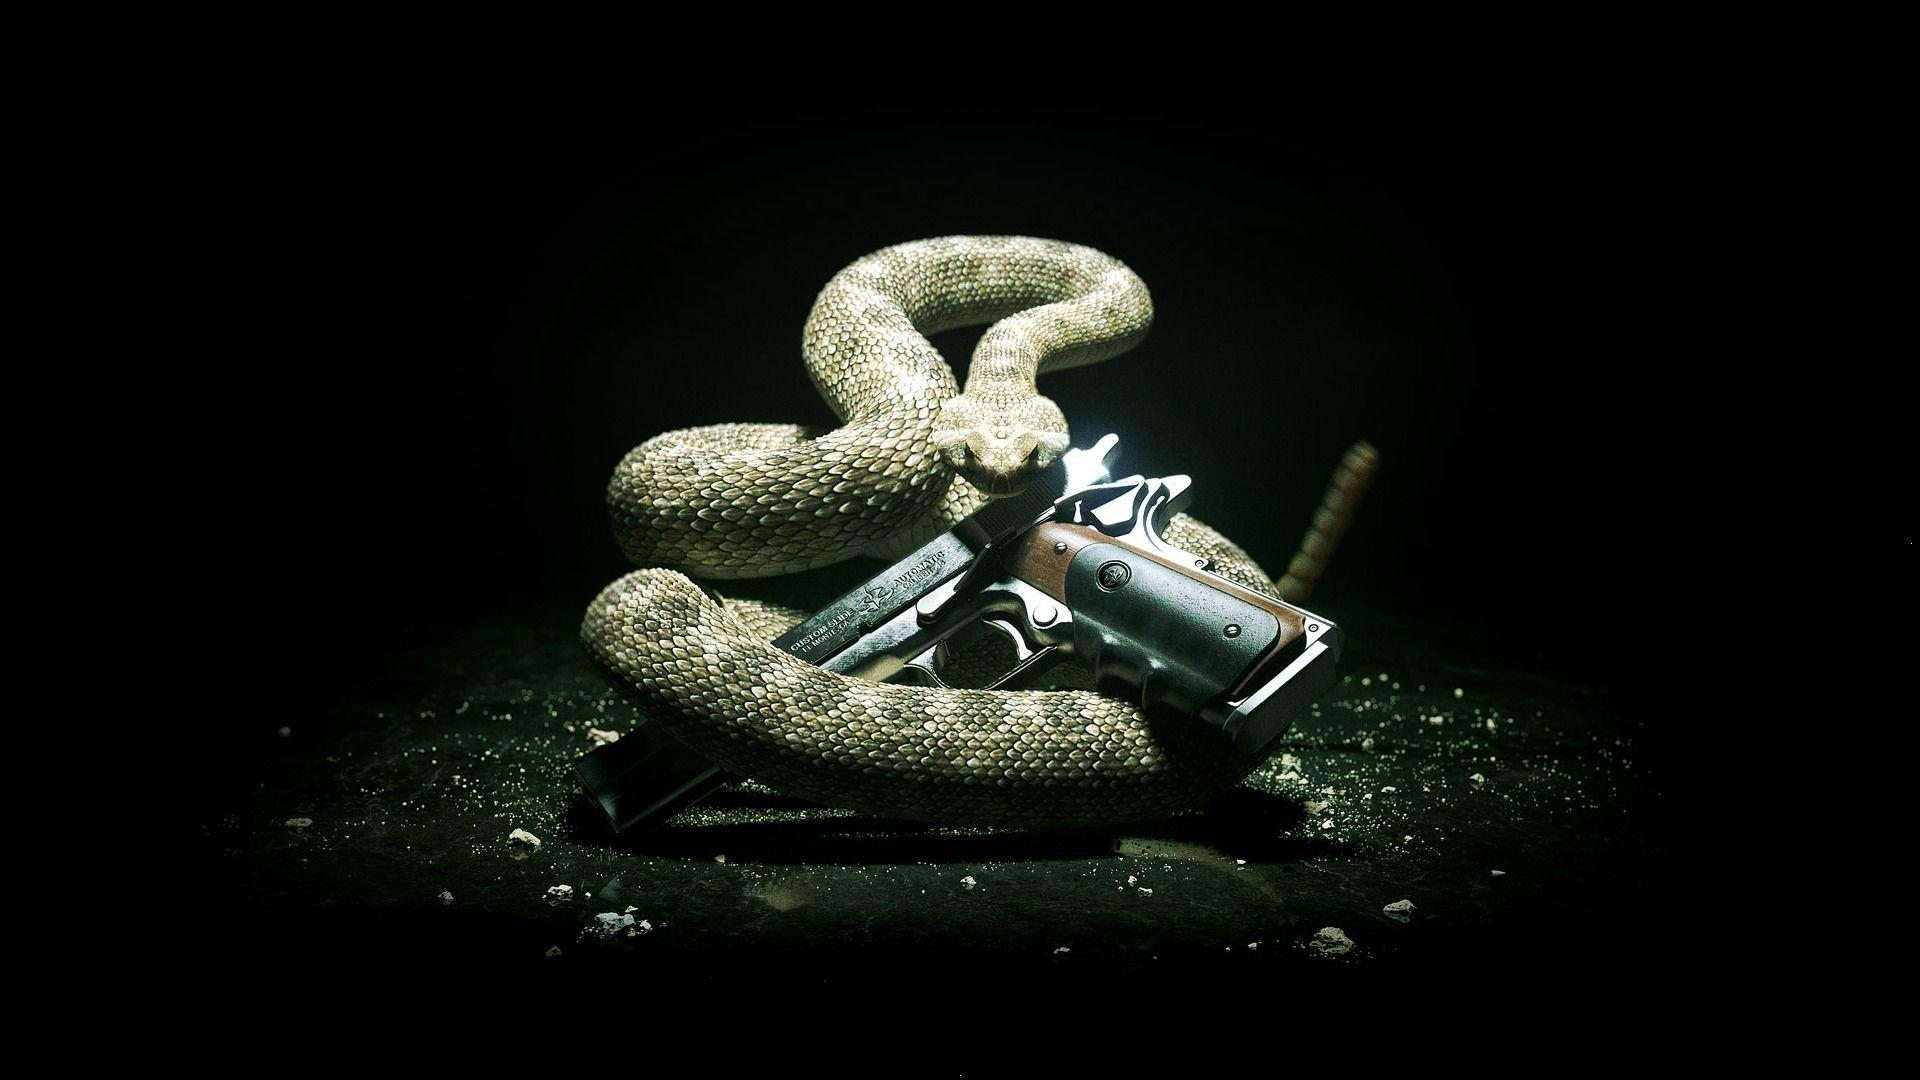 Don T Tread On Me Don T Tread On Me Wallpaper Snake Wallpaper Guns Wallpaper Snake Images